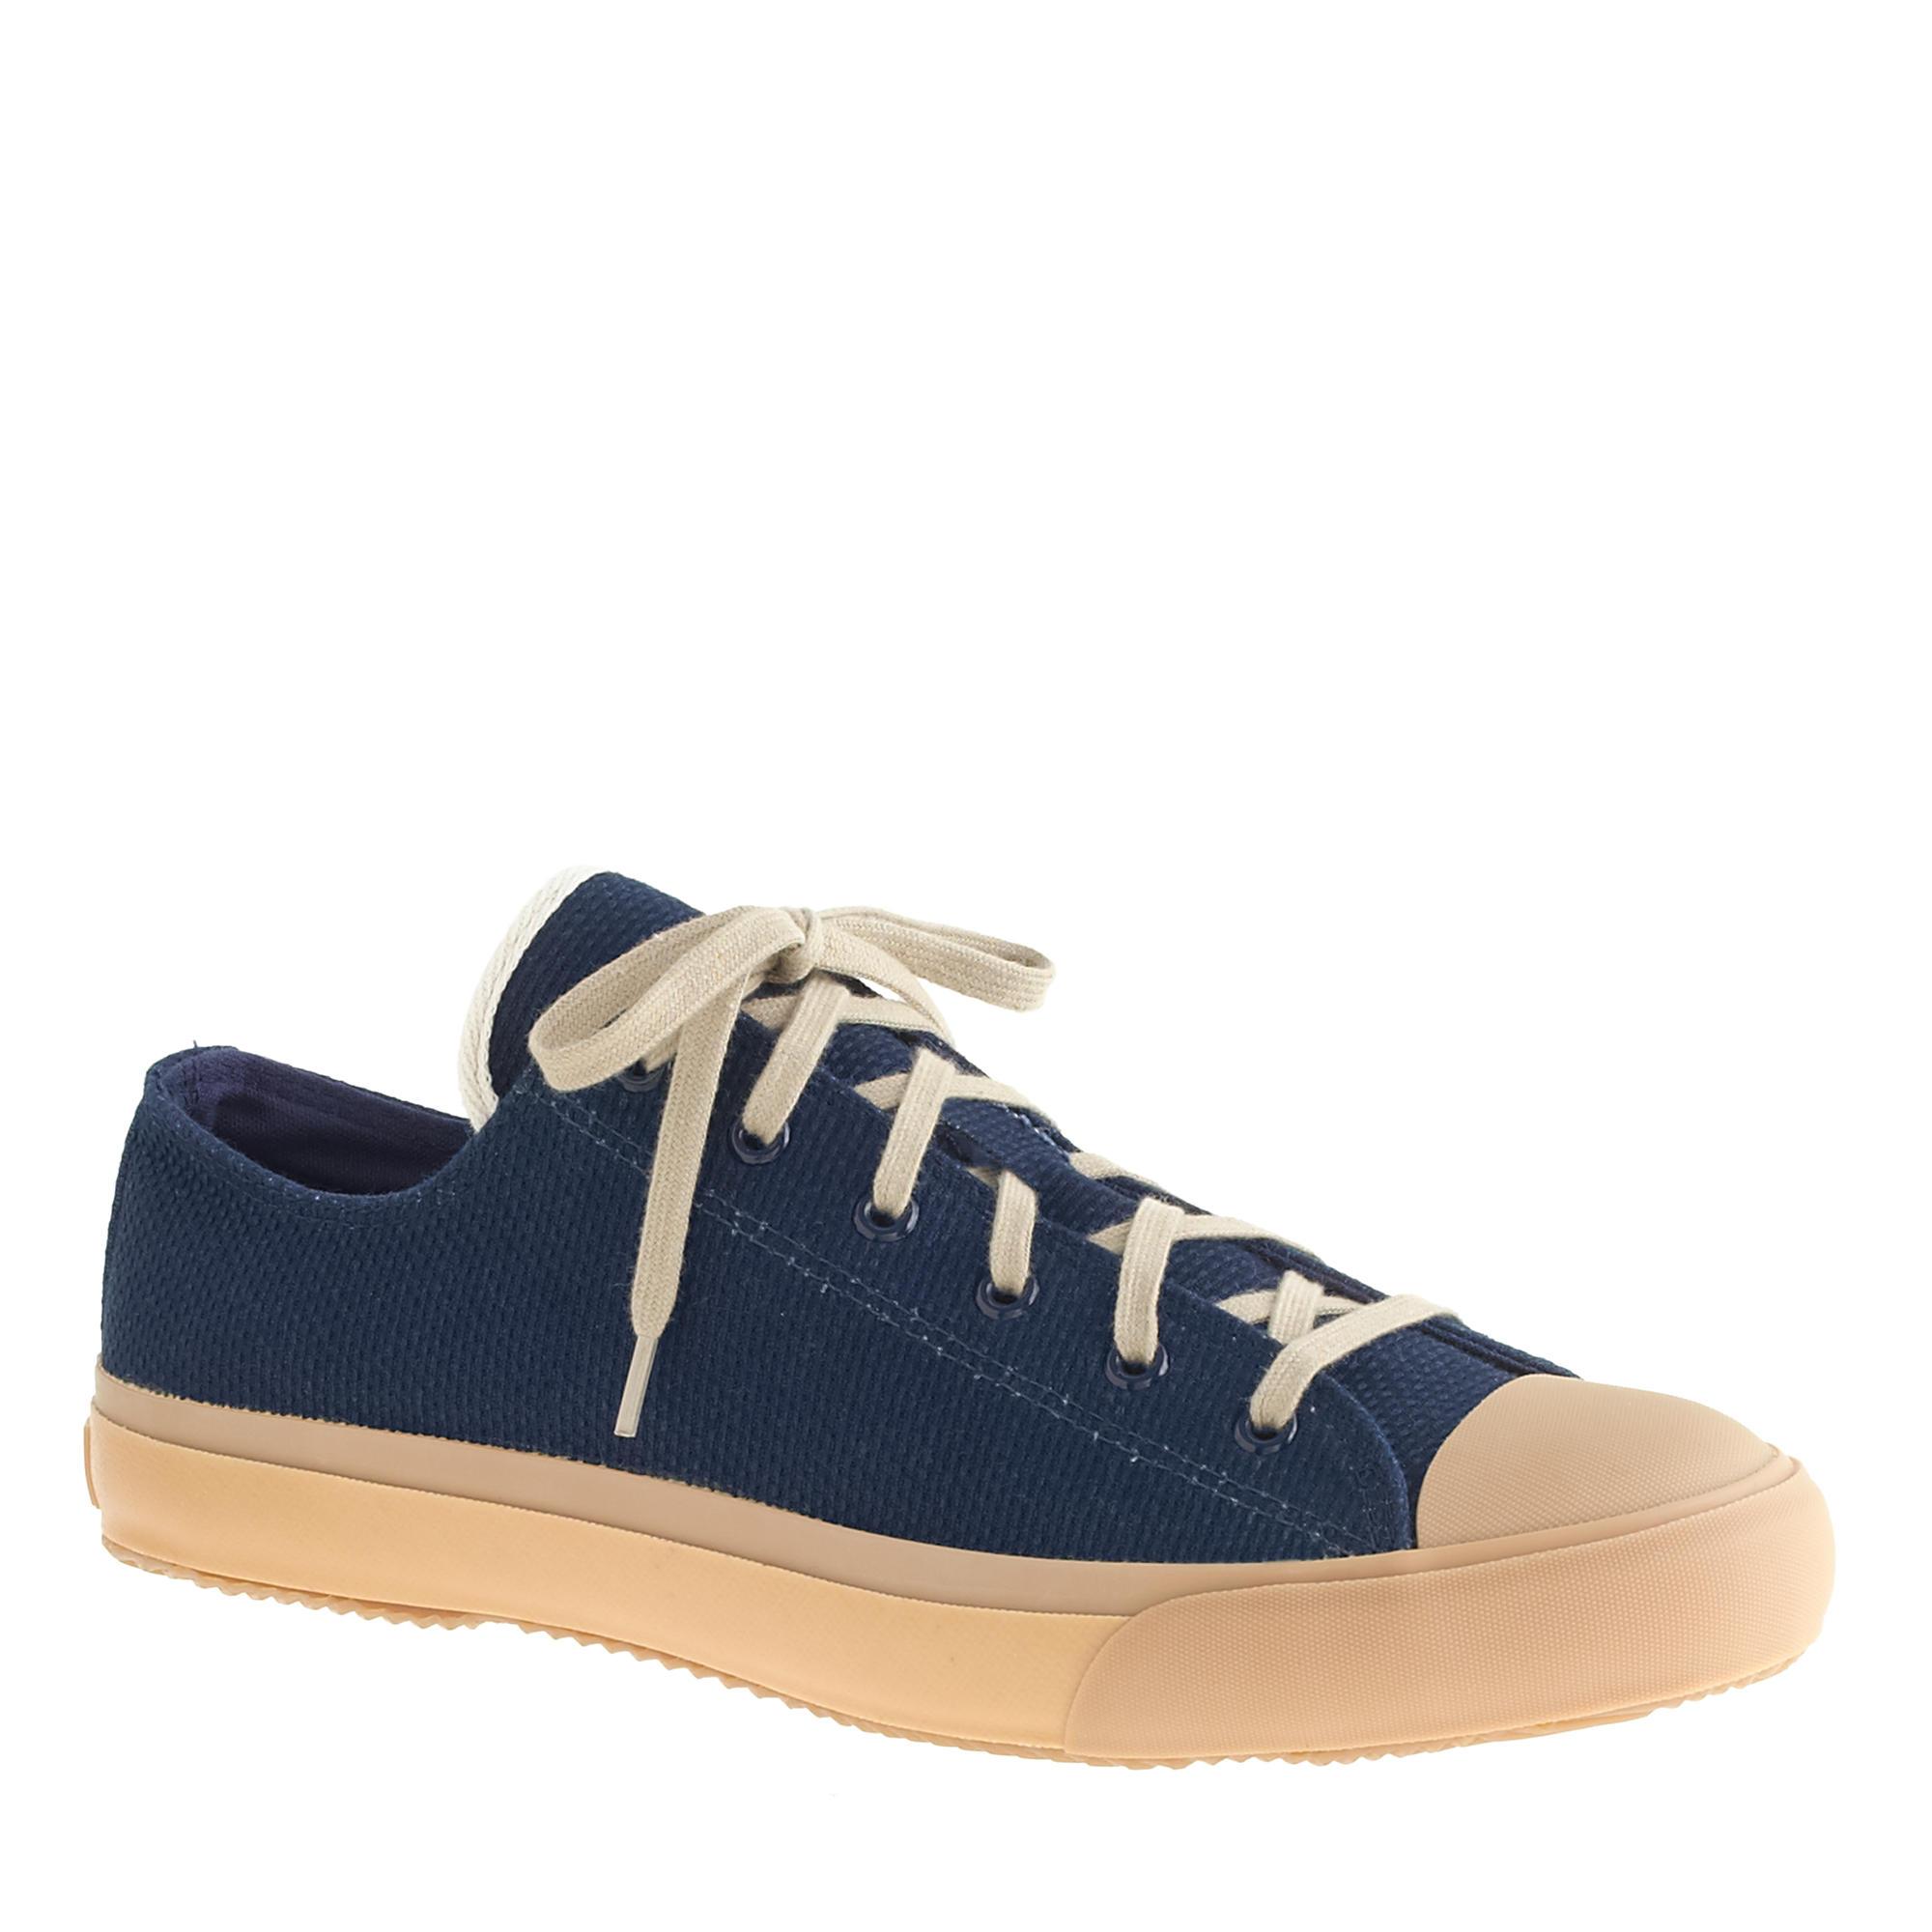 Shoes Run Half Size Larger